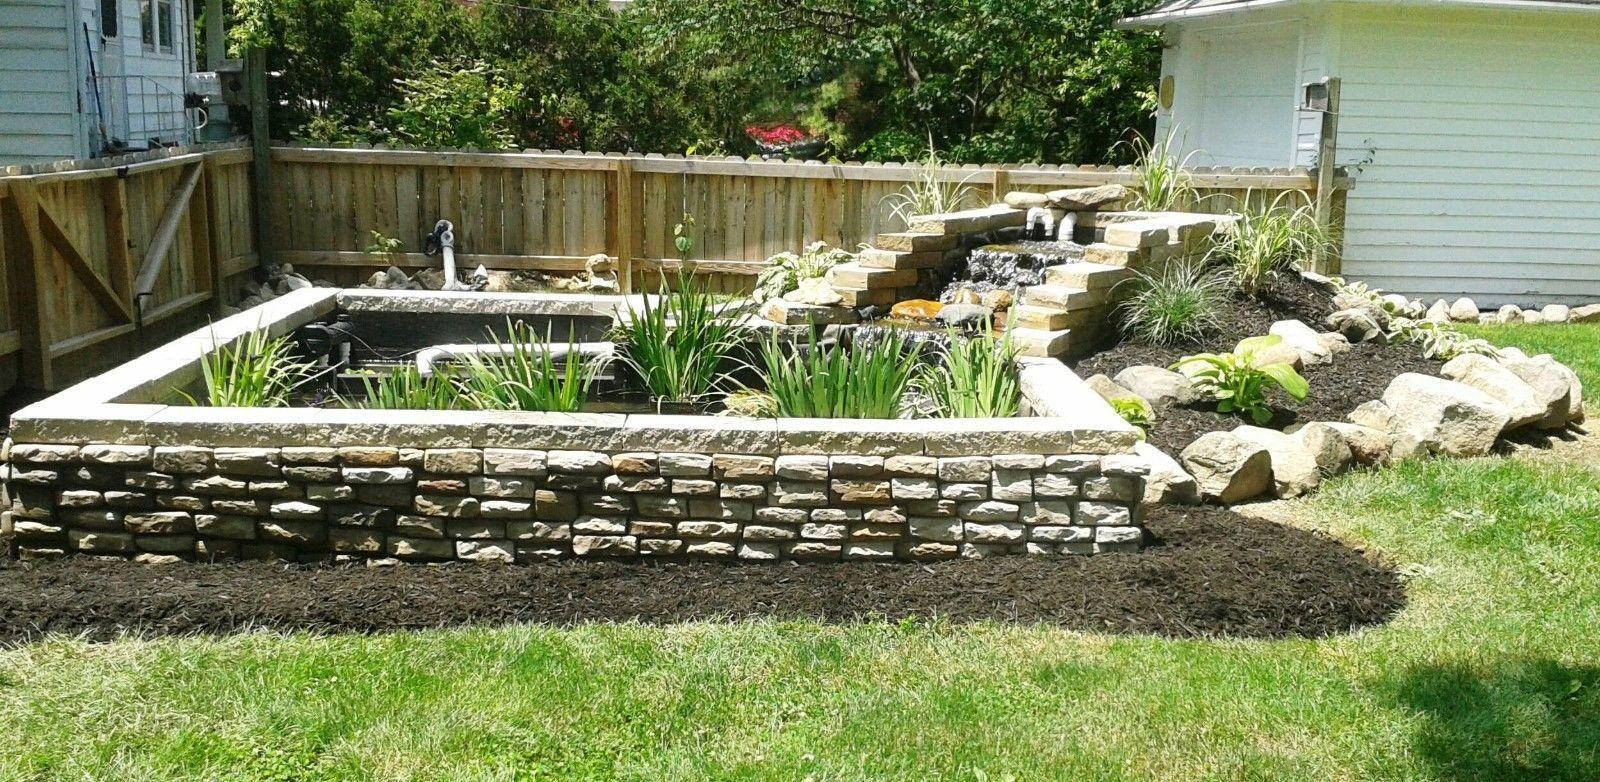 #OKL-05 Limestone Veneer Stone Concrete Molds (10) Make Stone For Pennies Each